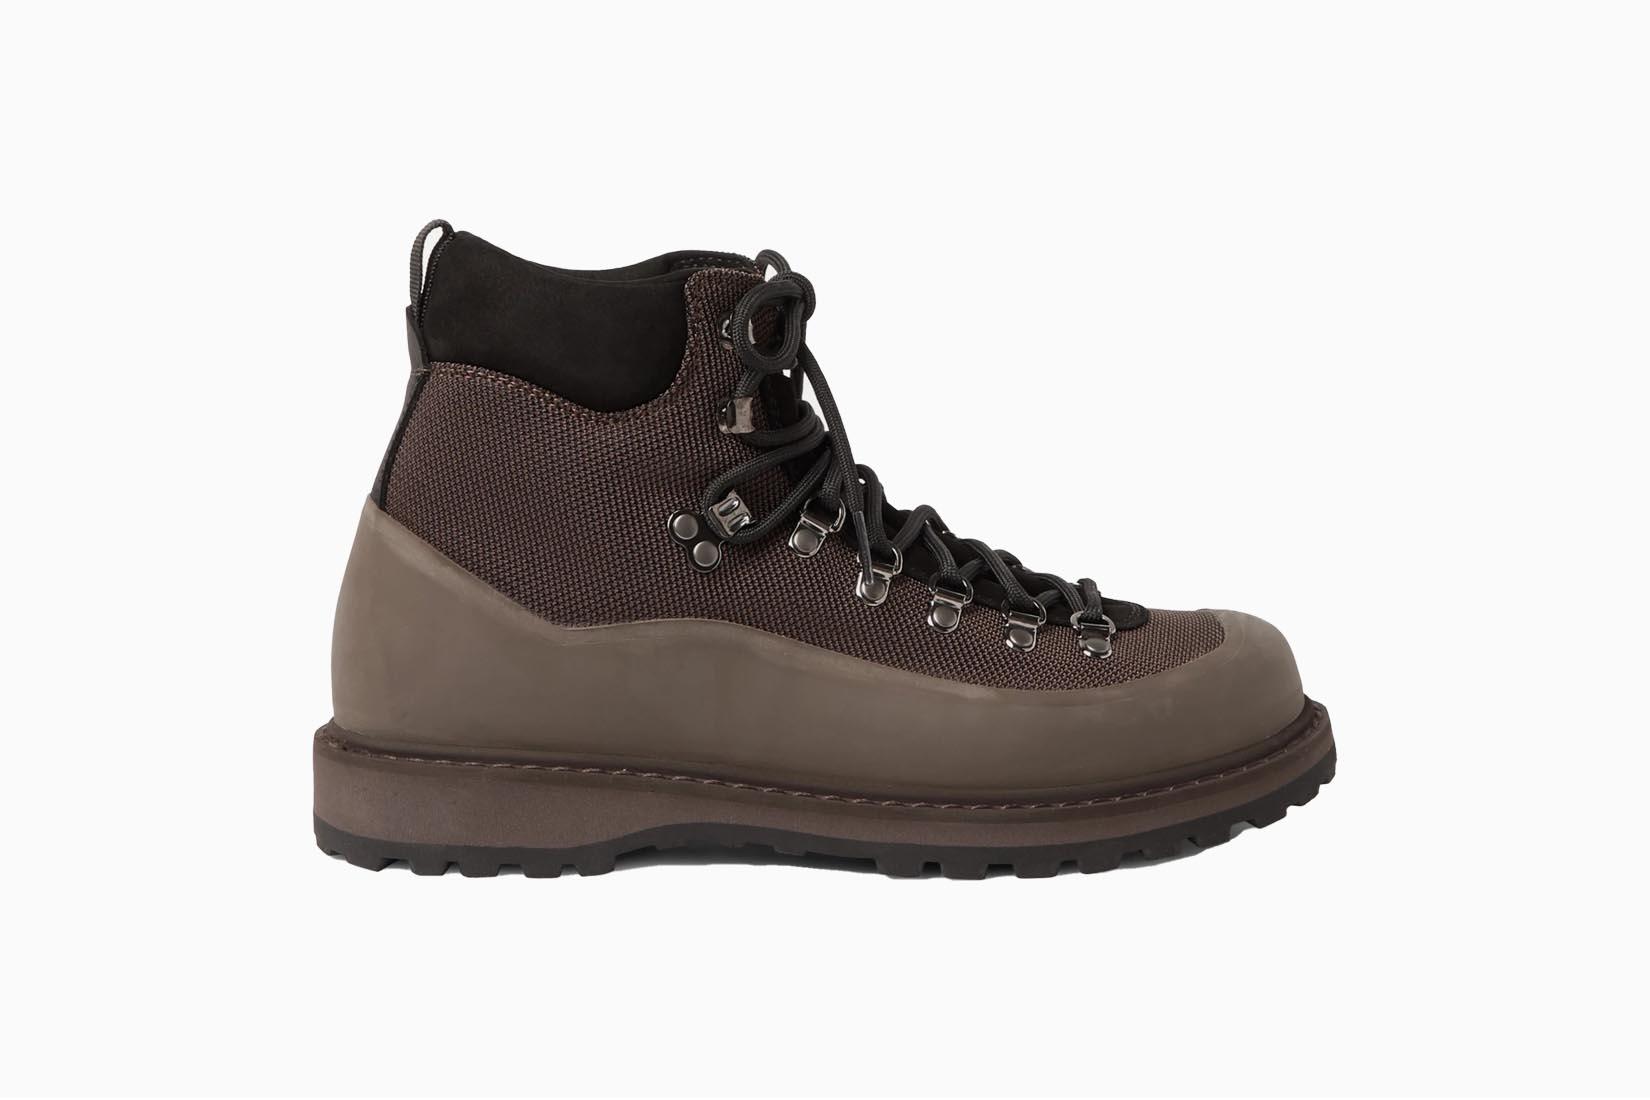 best boots men diemme hiking boots review Luxe Digital